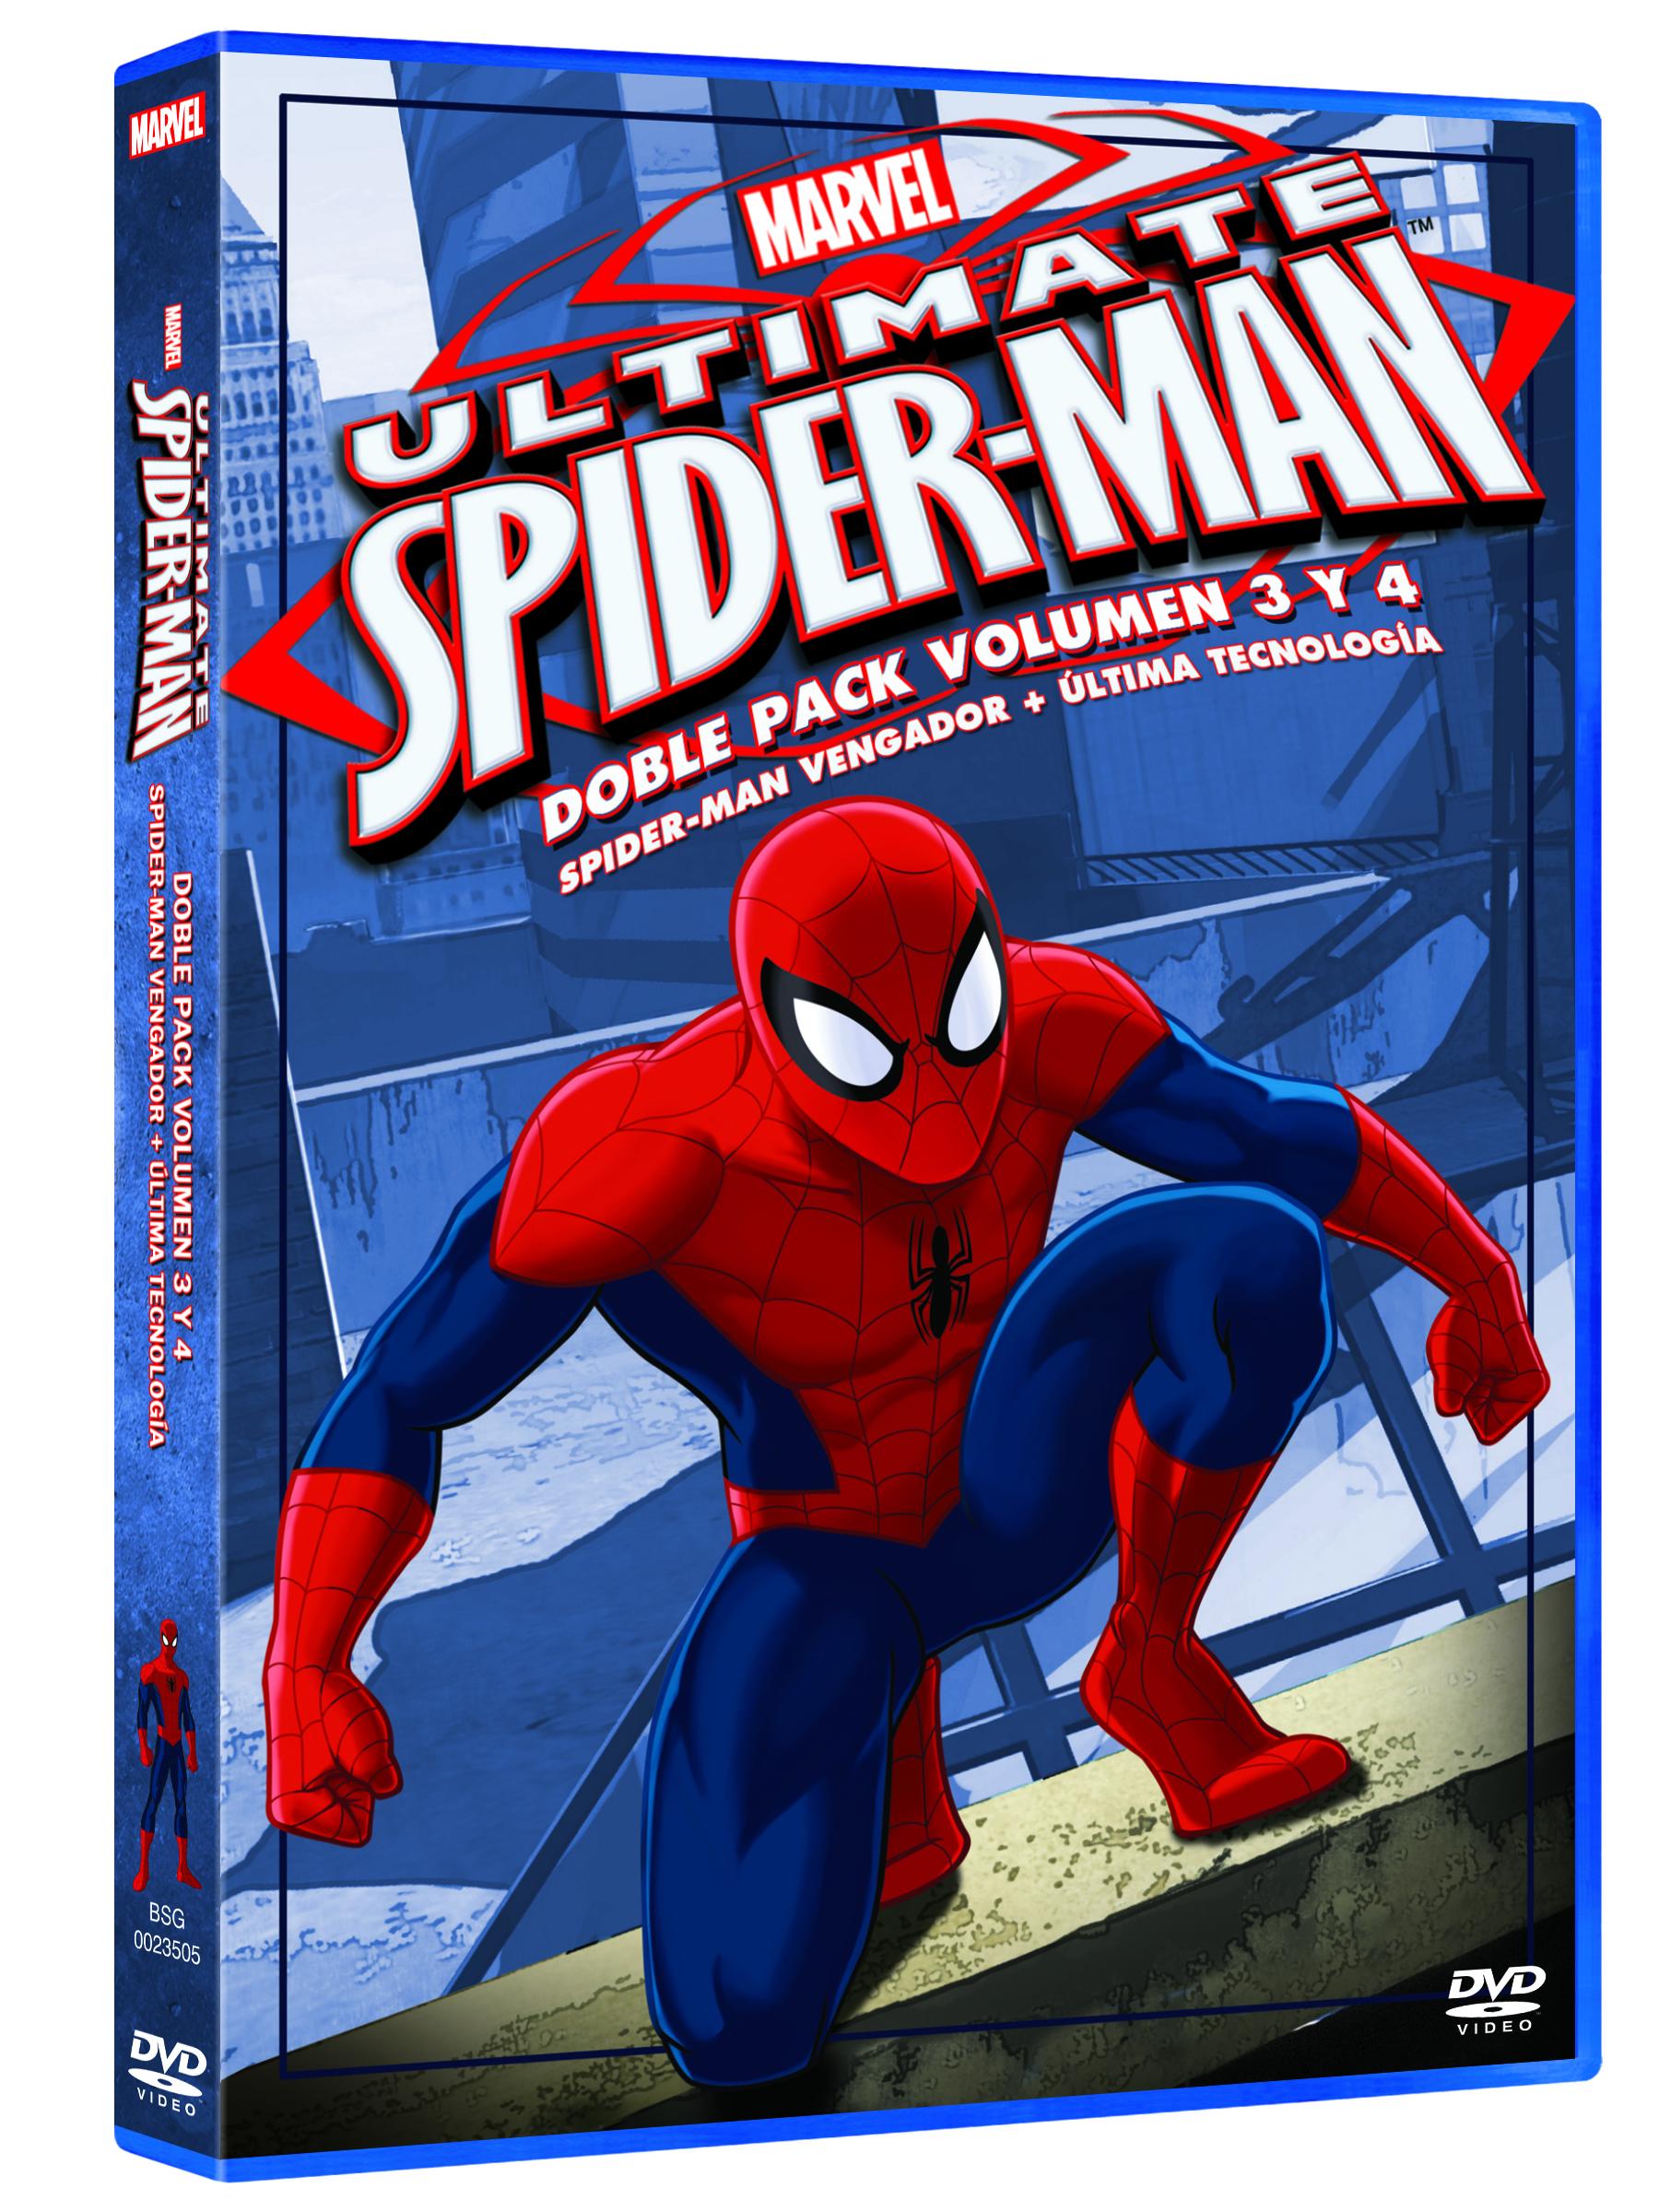 Pin Spider Man Dvd on Pinterest